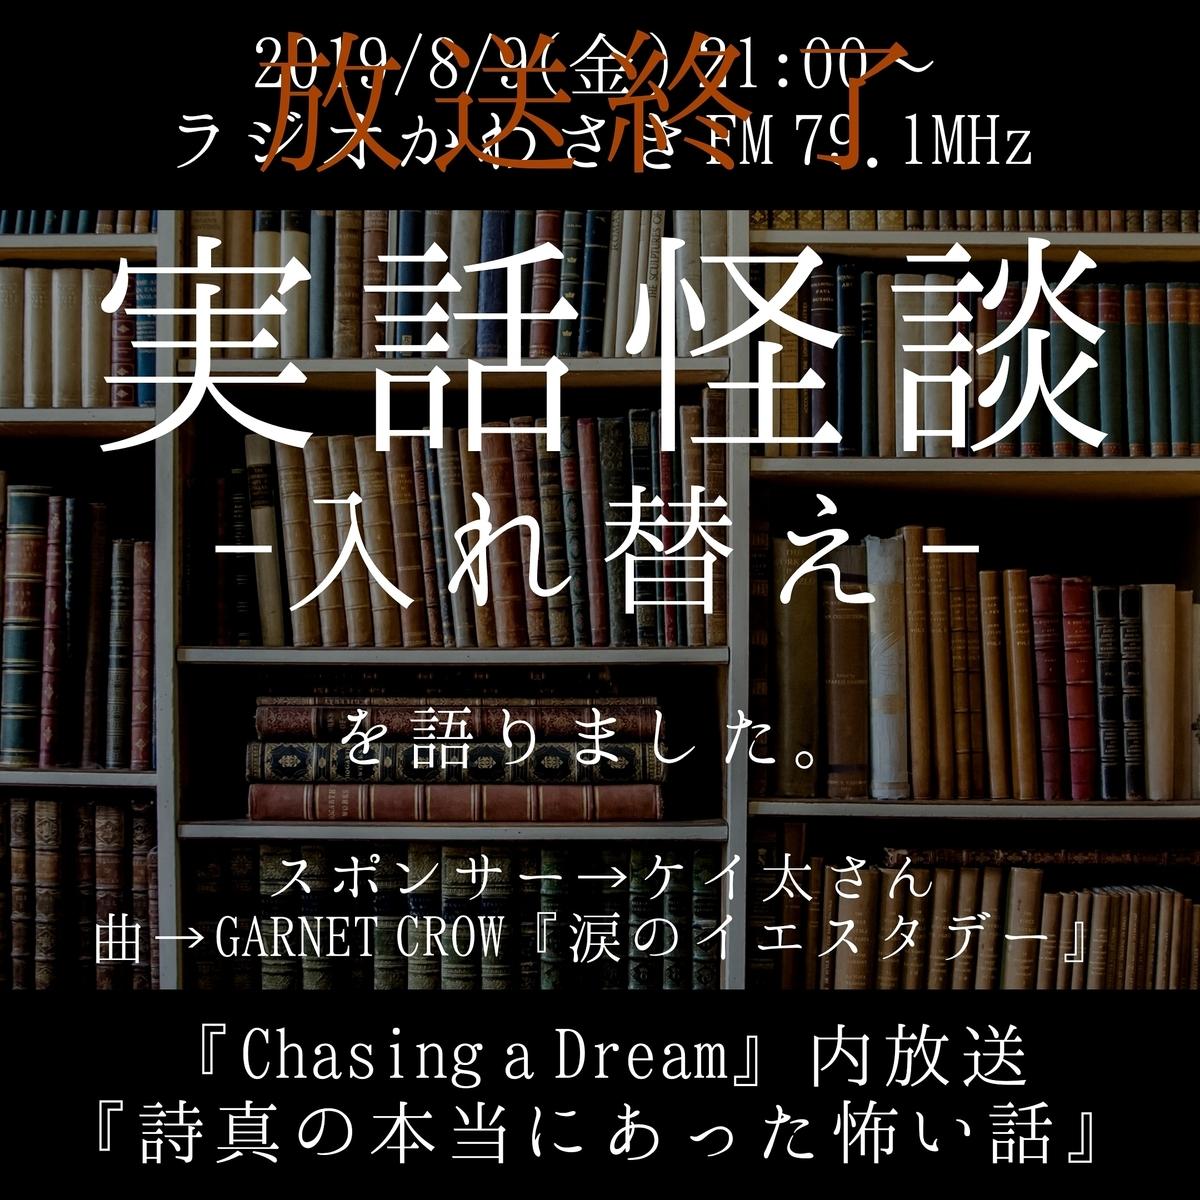 f:id:yukaitekietsu:20190811175228j:plain